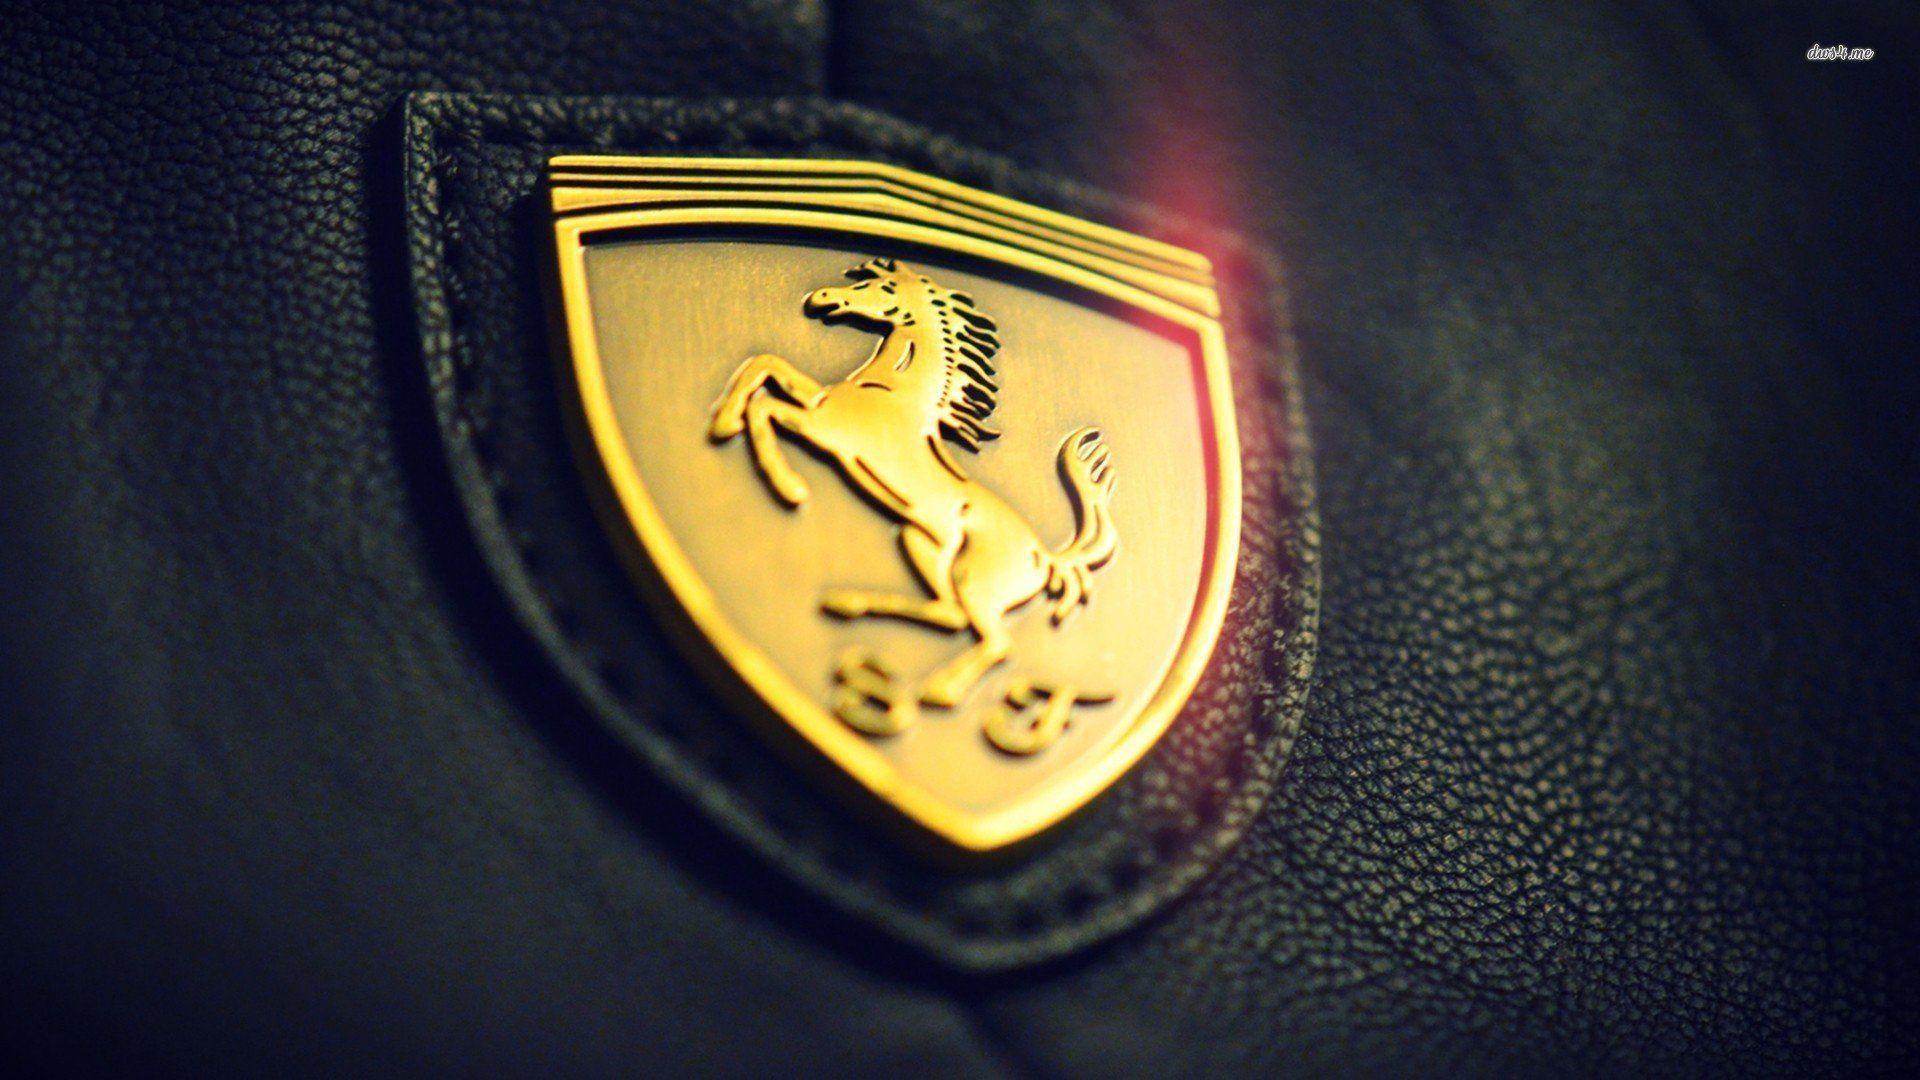 Scuderia Ferrari Background 8